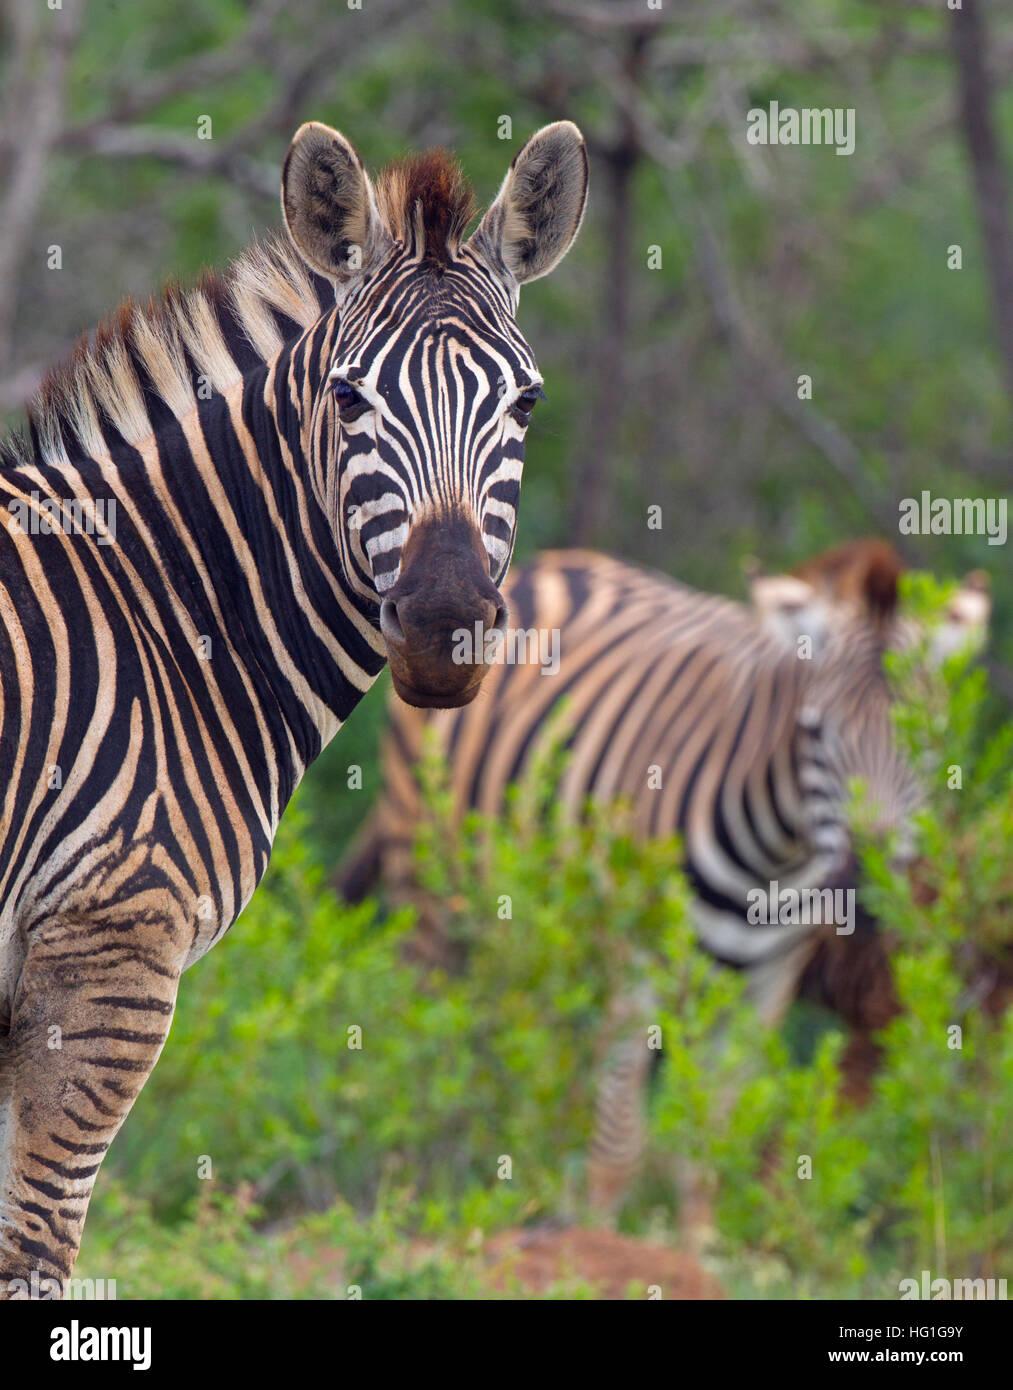 Burchell's zebra Equus quagga burchellii  Natal S. Africa - Stock Image